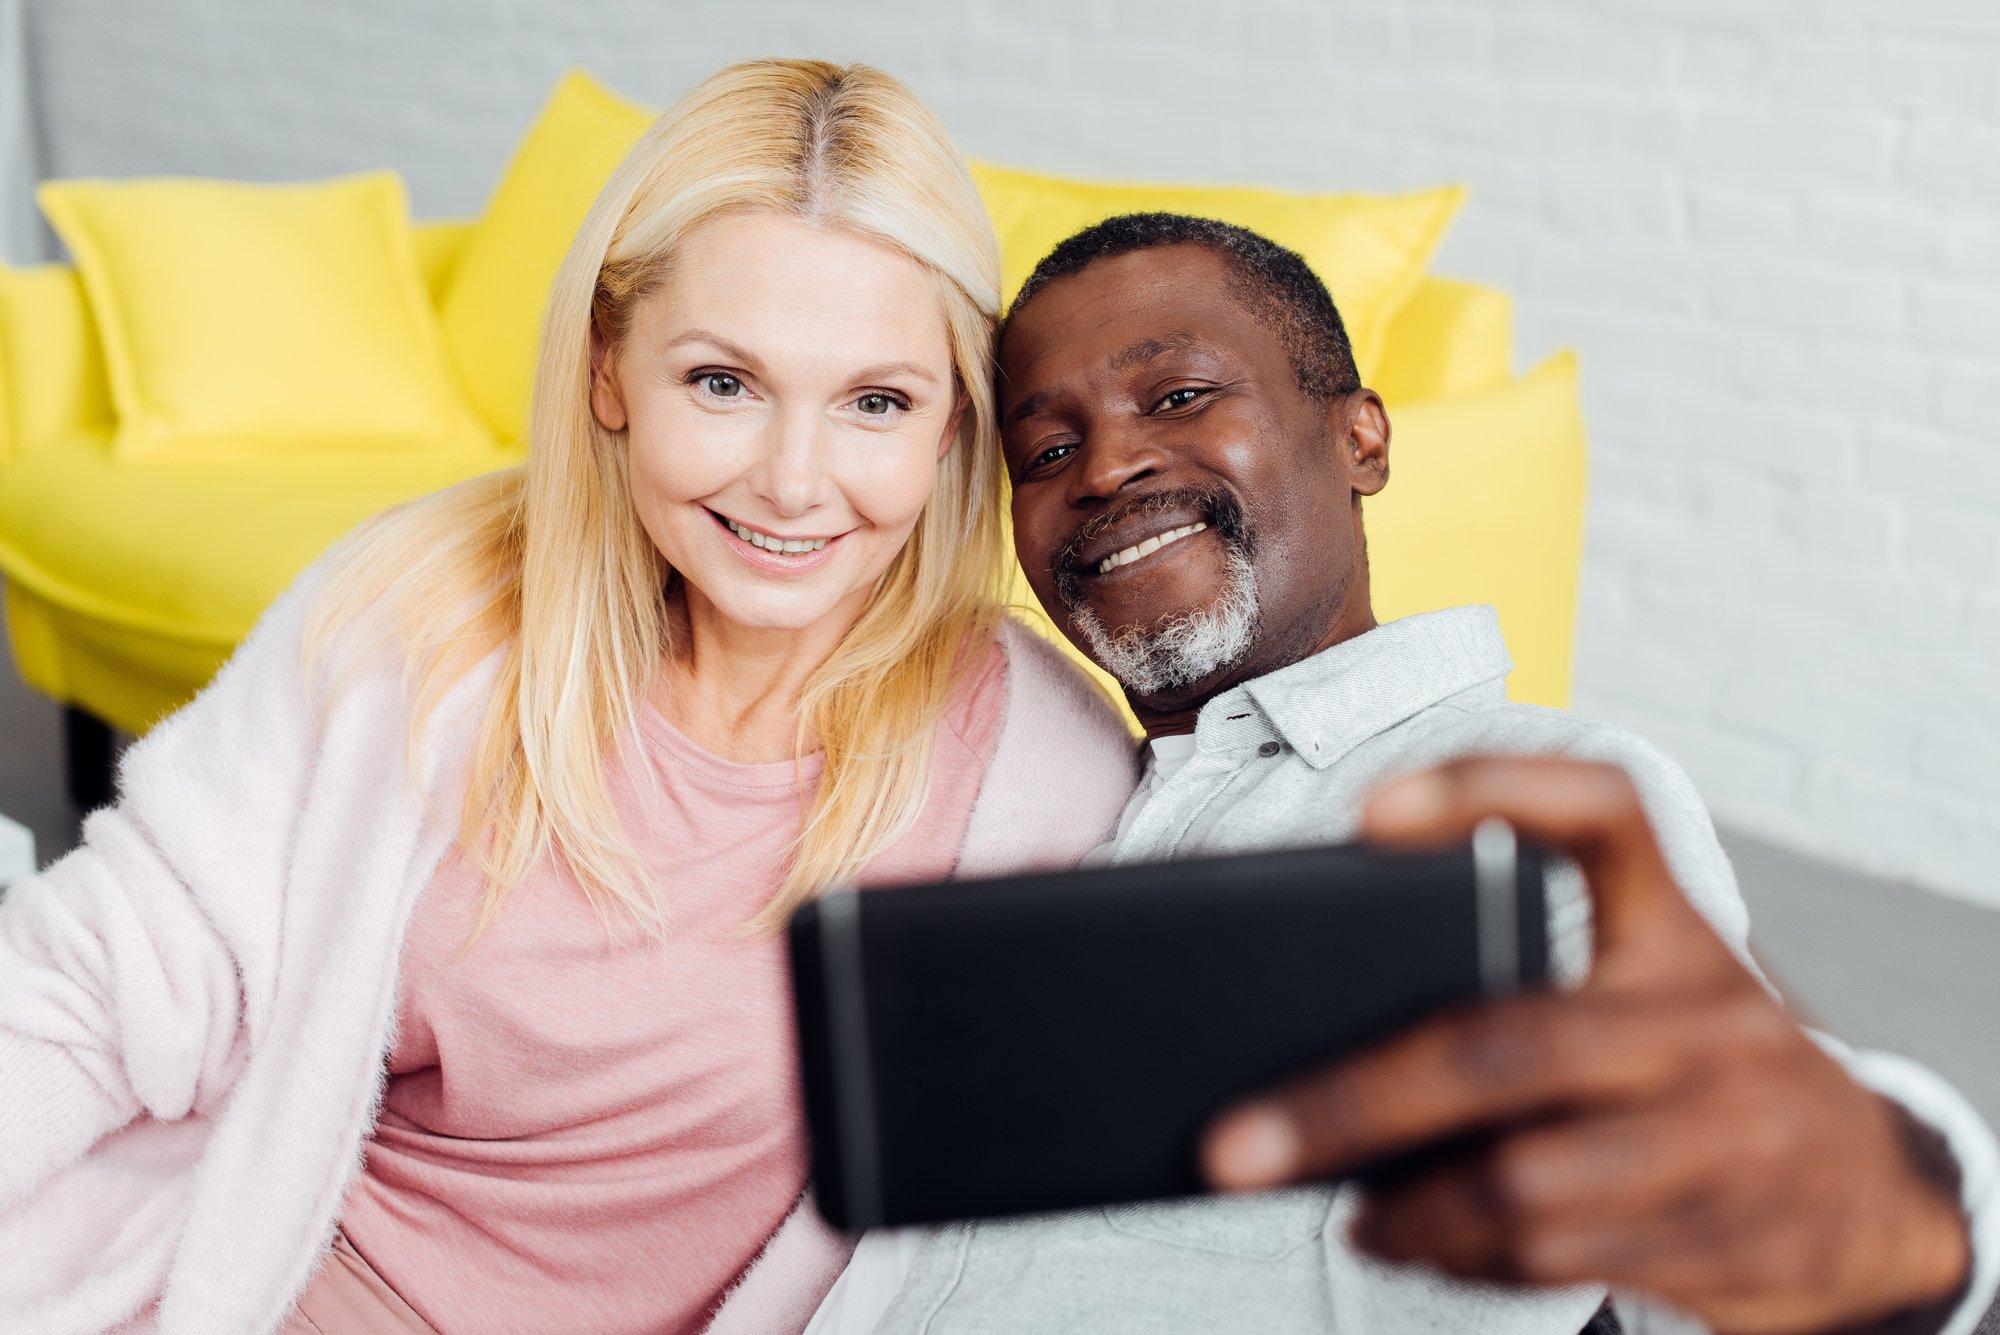 Smiling mature woman and african american man taking selfie